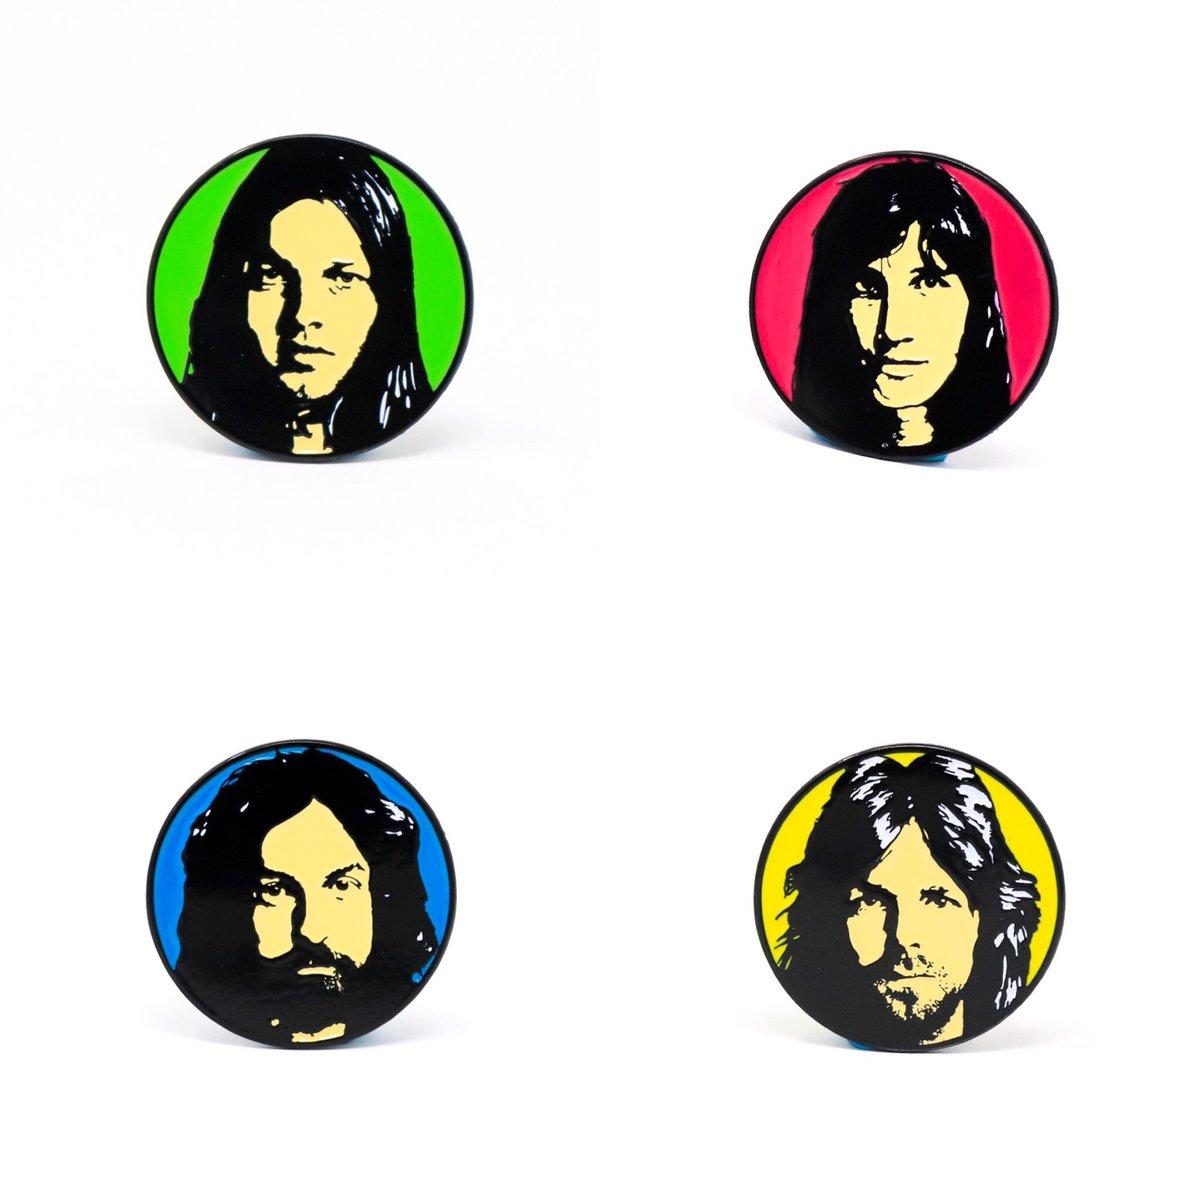 Image of Pink Floyd 'Echoes' Enamel Pin Set